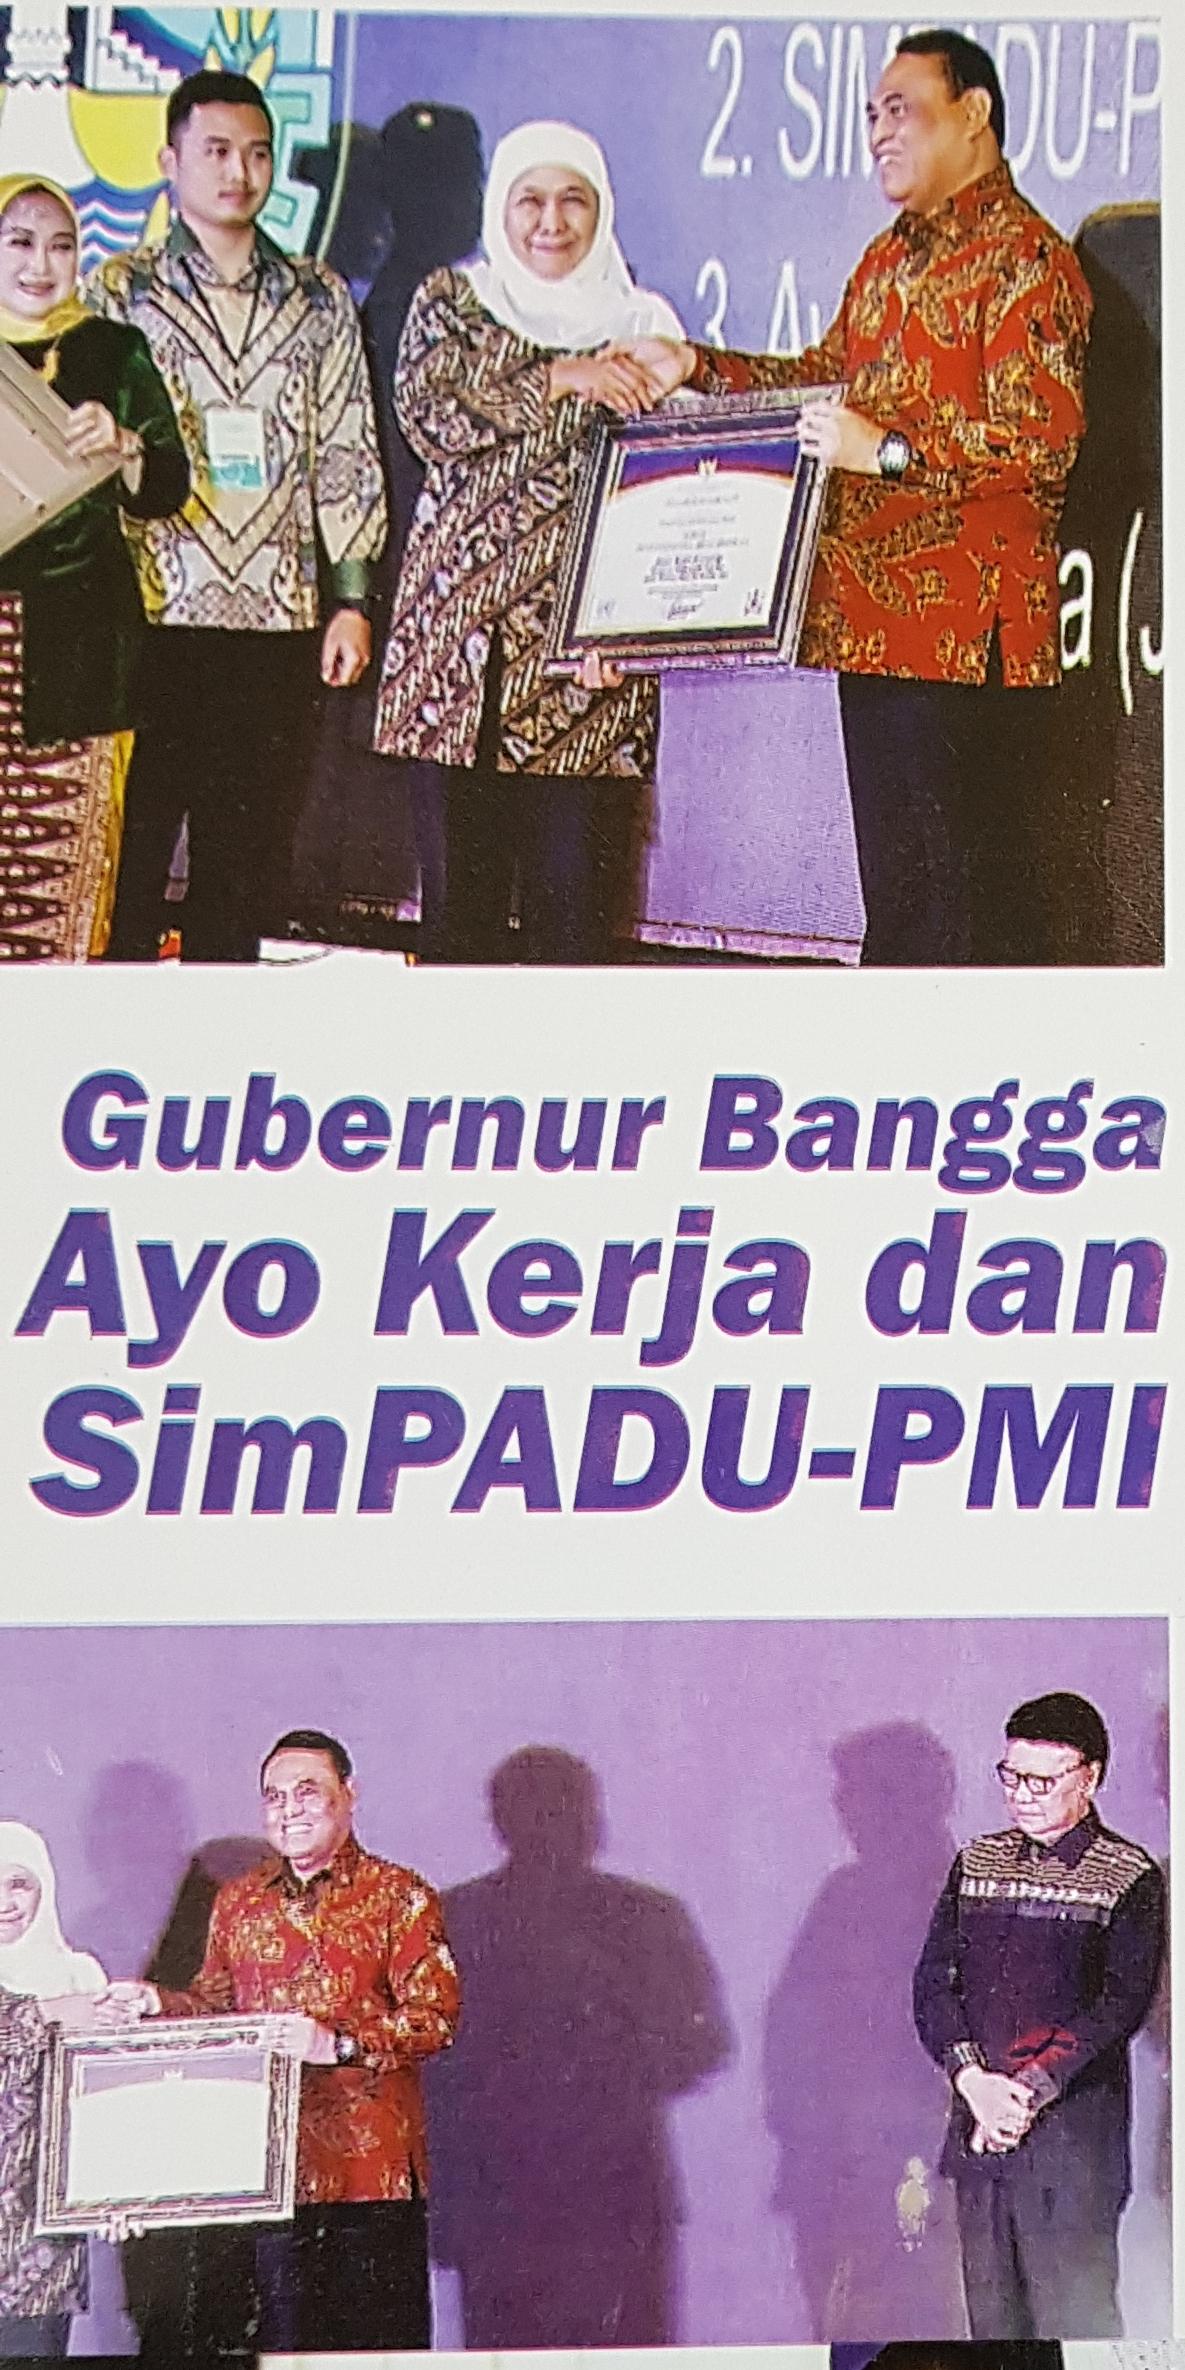 Gubernur Jatim Bangga Inovasi AyoKerja dan simPADU-PMI ikut Serta di Anjang United Nations Public Service Award (UNPSA) 2019